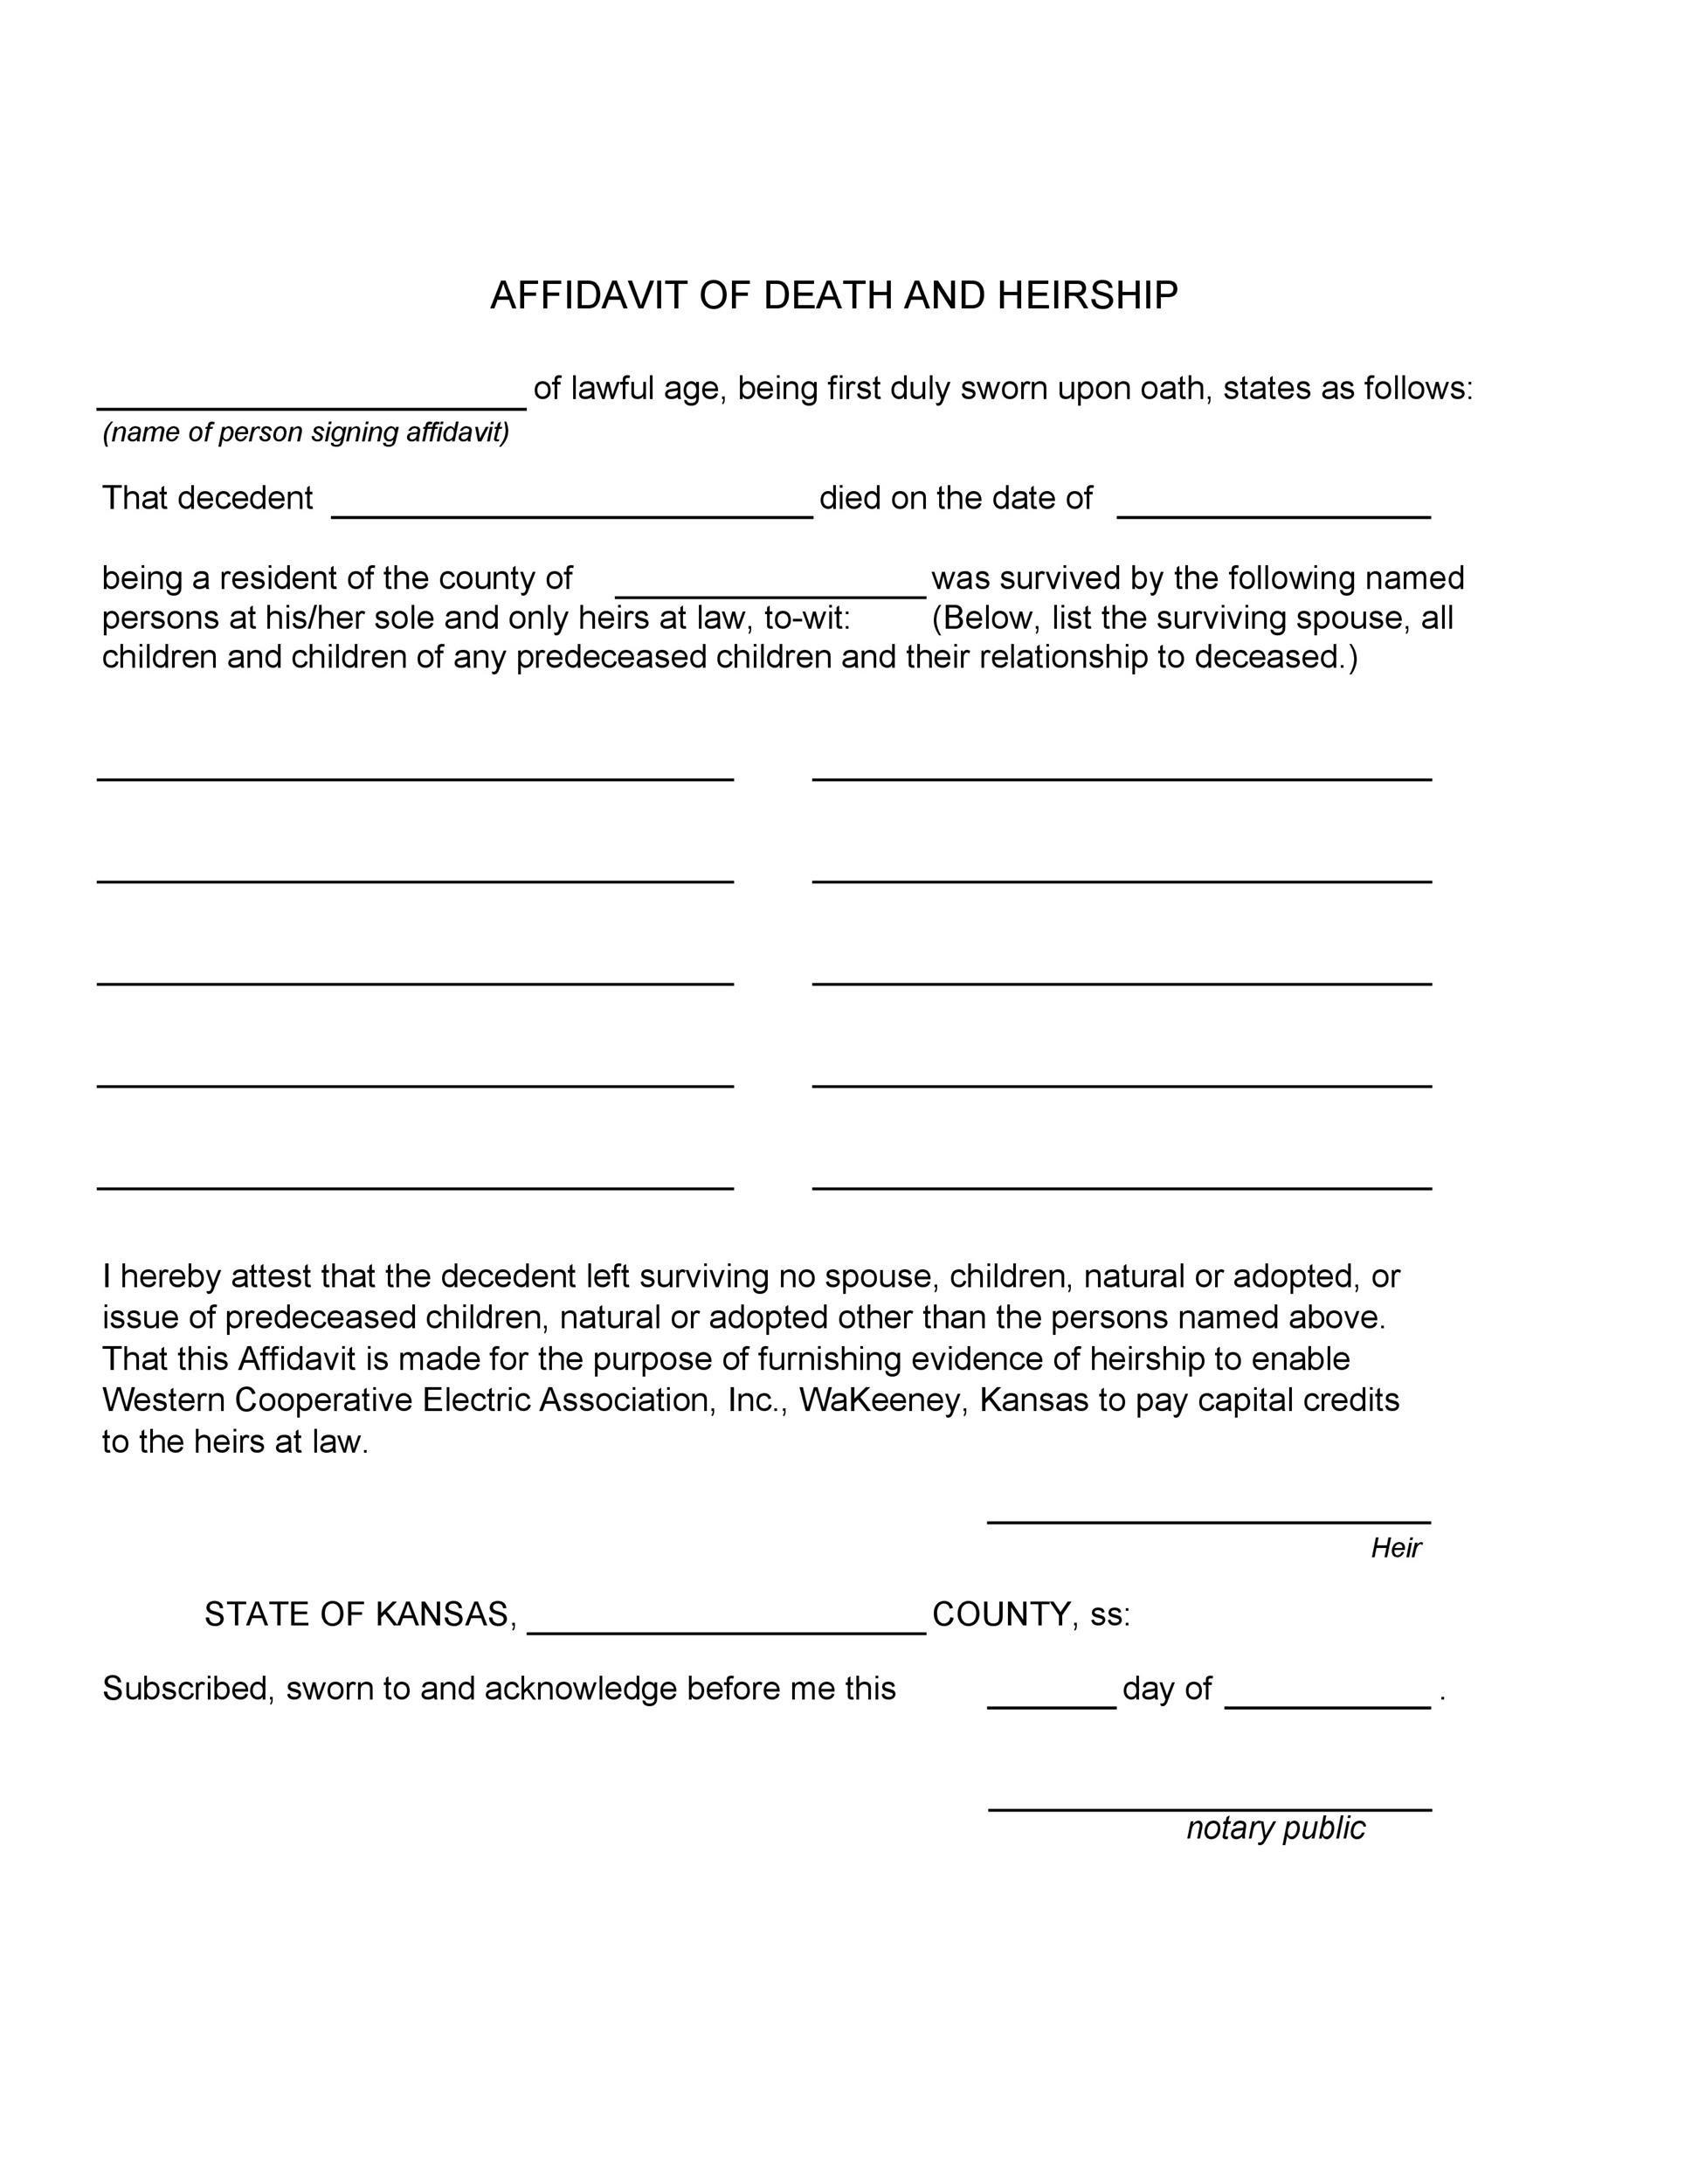 Affidavits Of Death